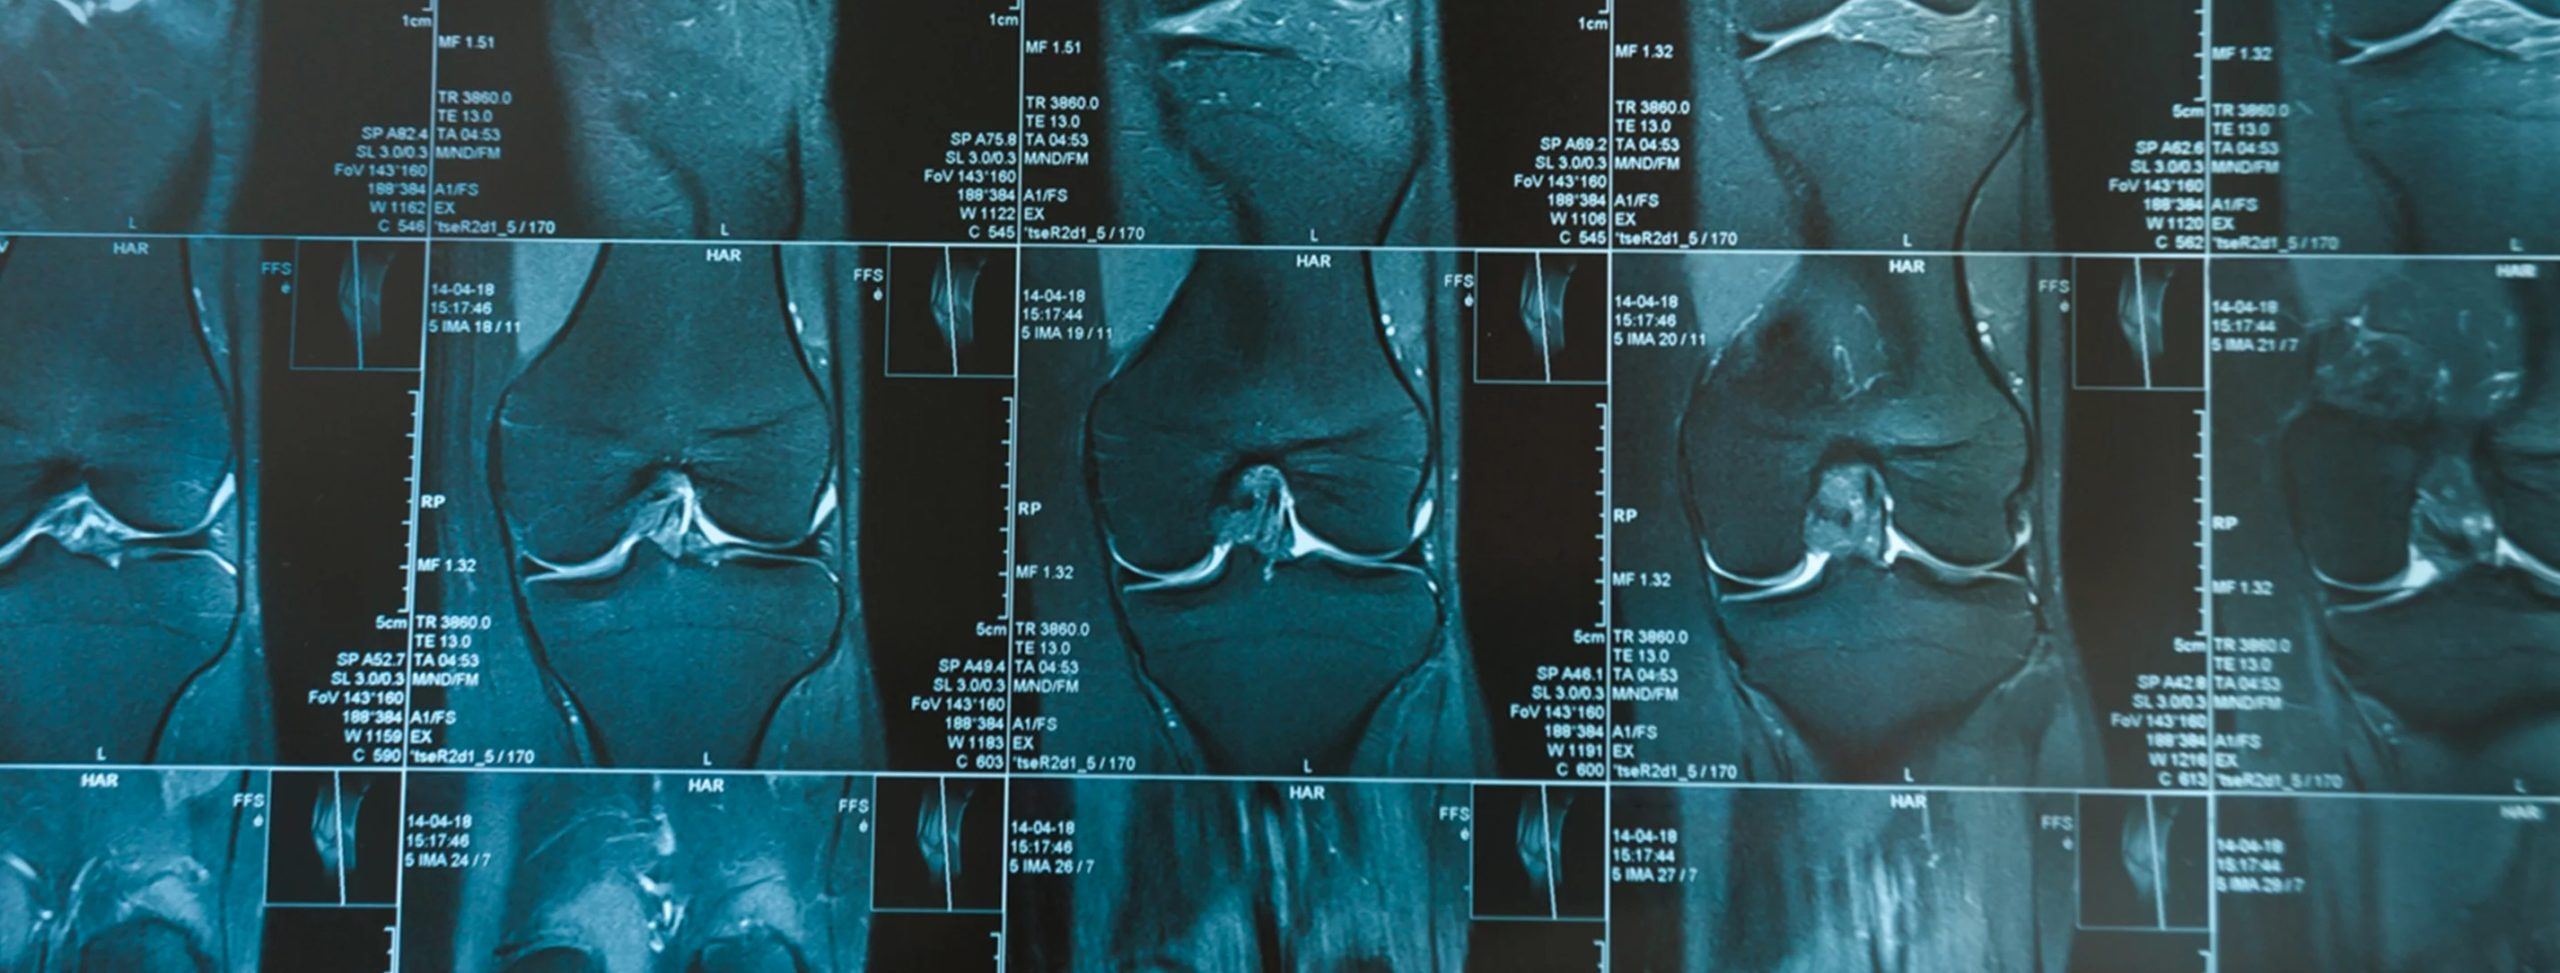 Prevalenza di alterazioni strutturali in ginocchia asintomatiche